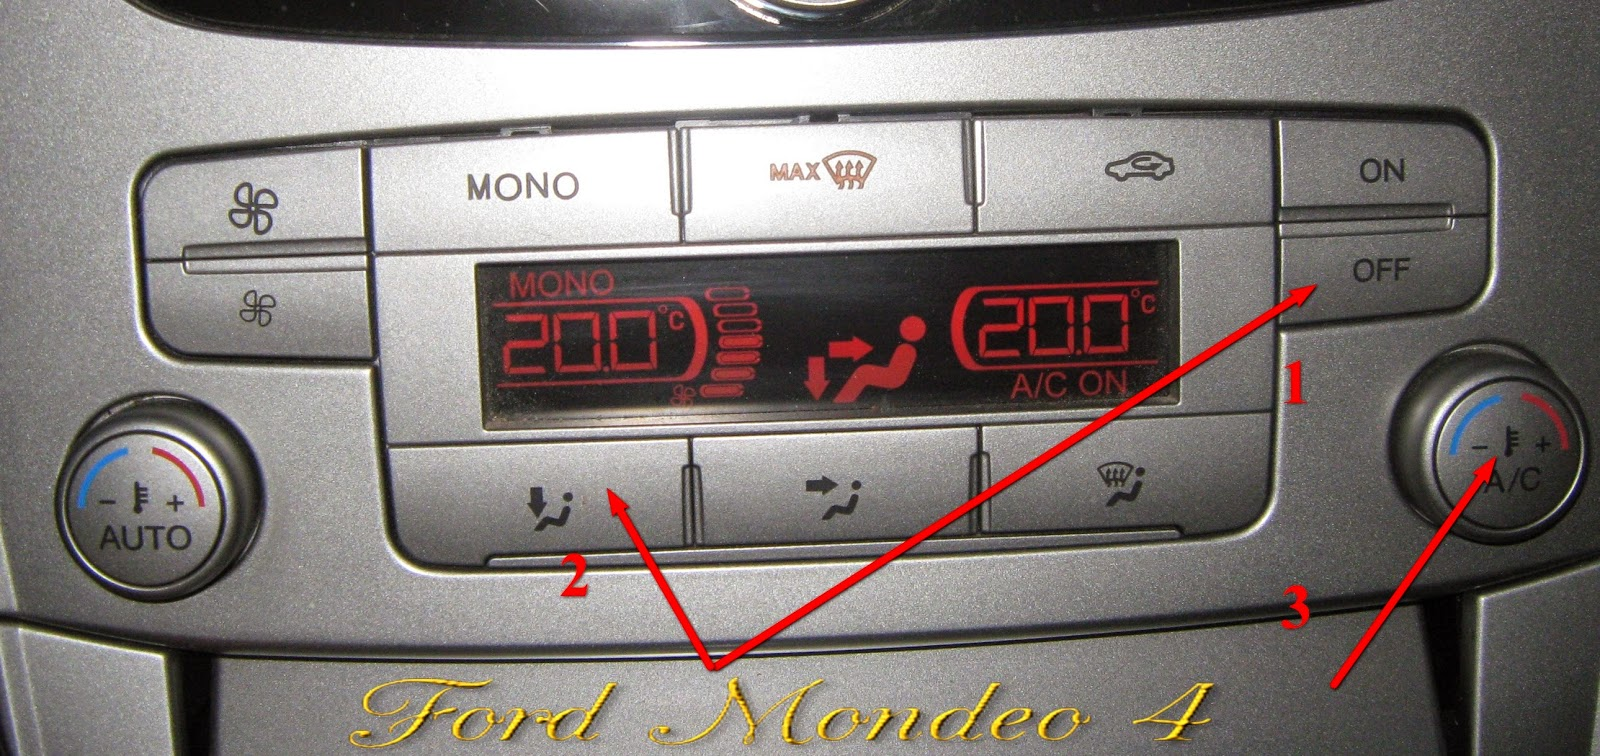 климат контроль форд мондео 4 #10